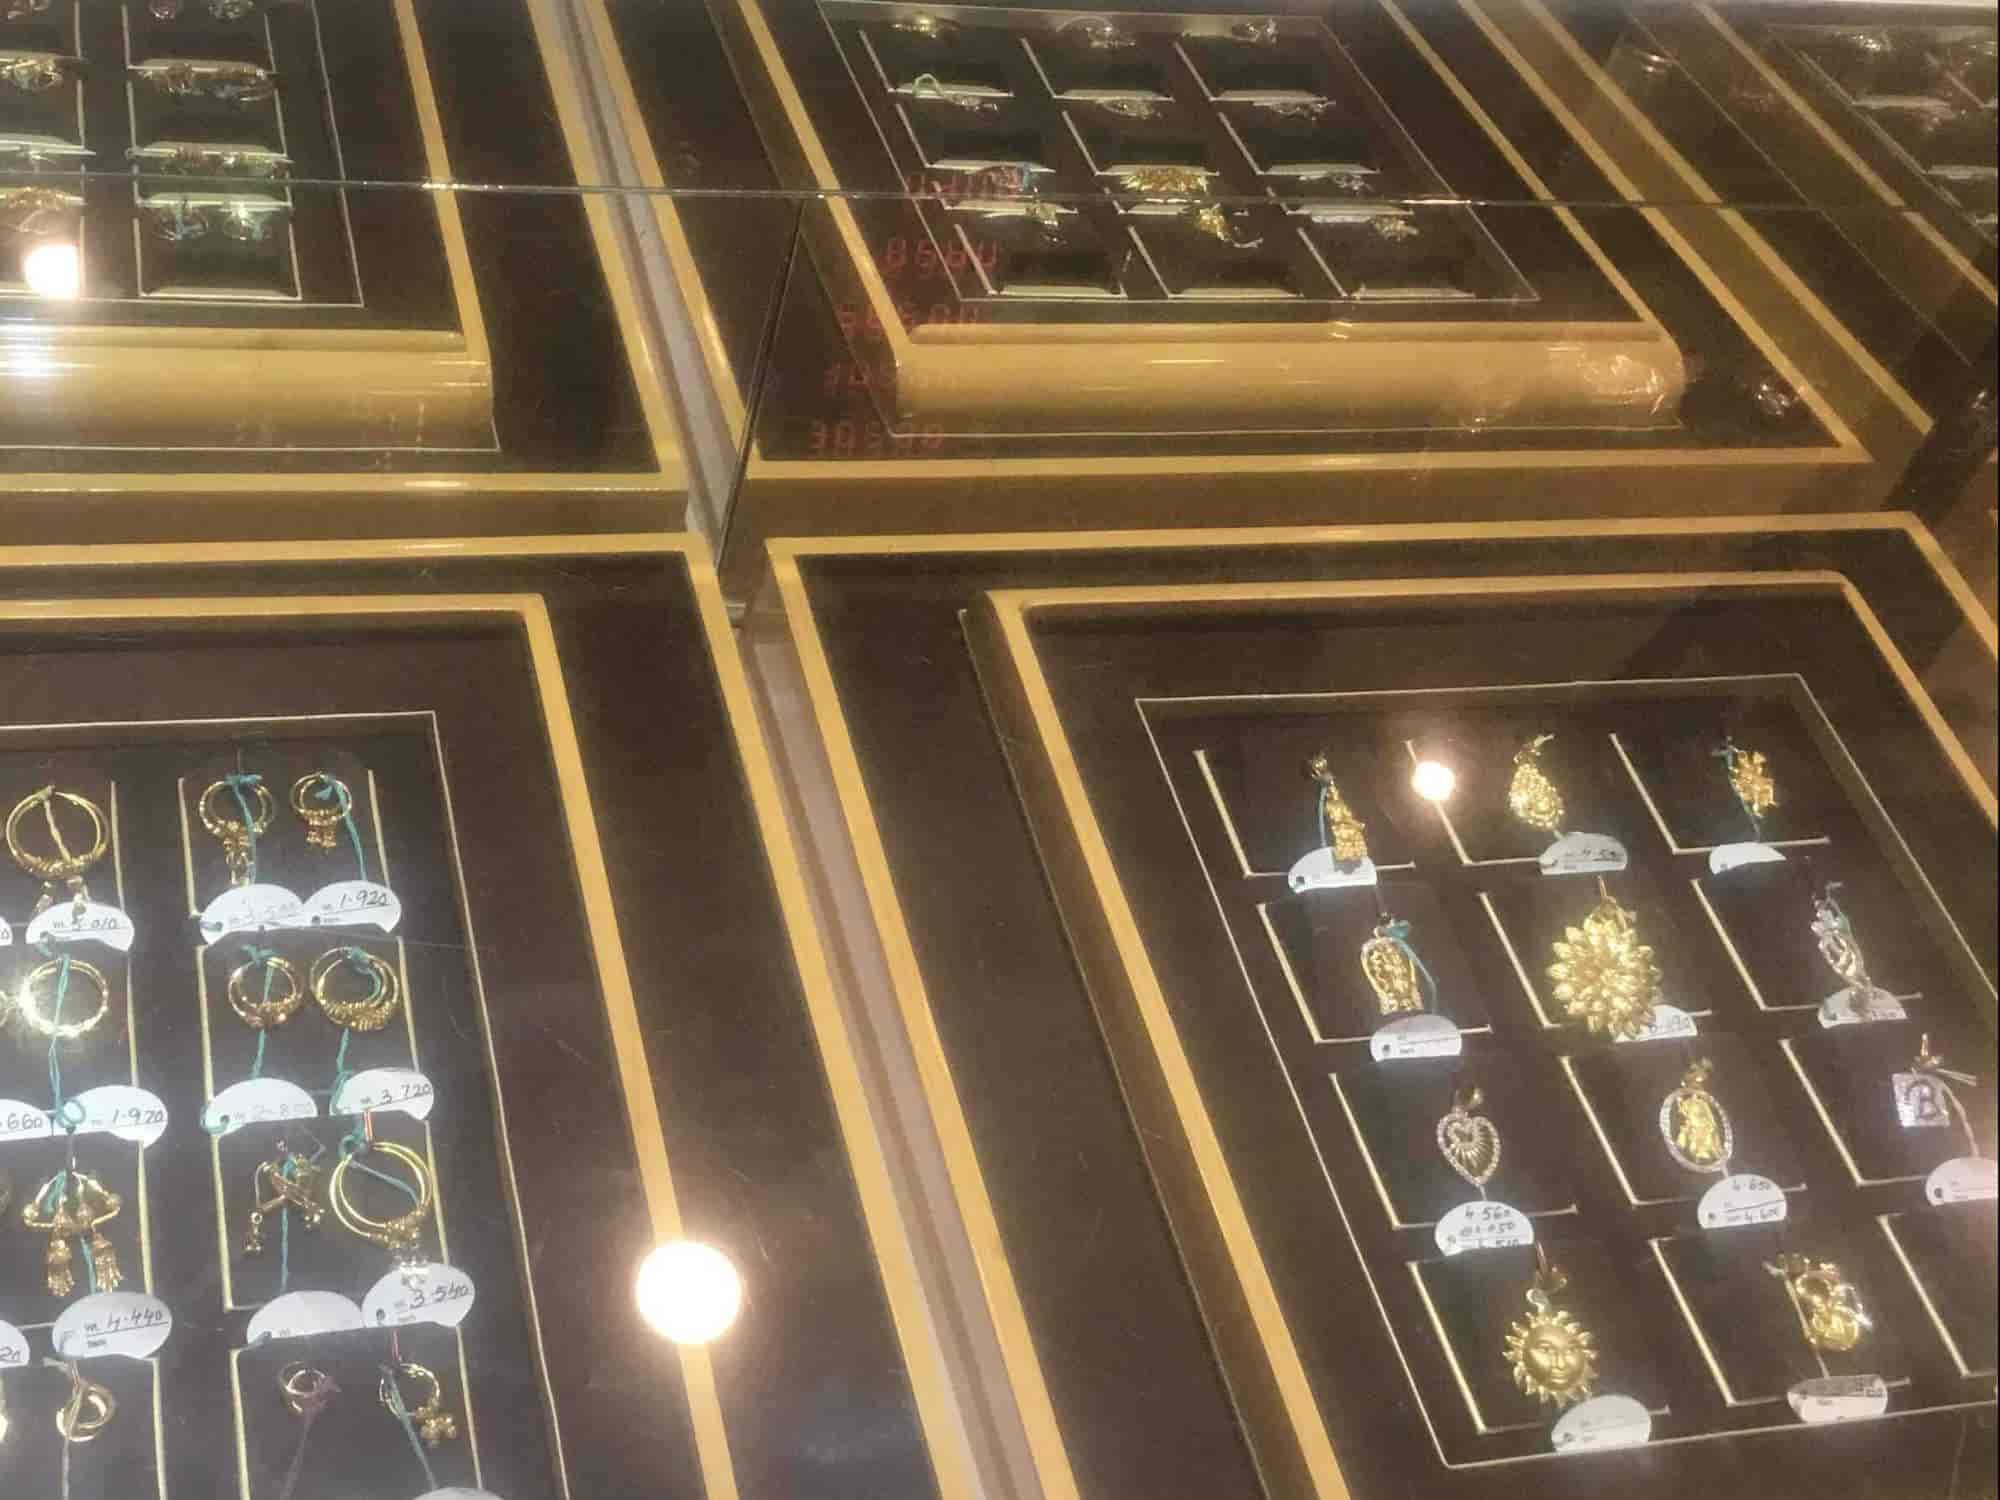 Harish Jewellery, Balasore HO - Jewellery Showrooms in Balasore